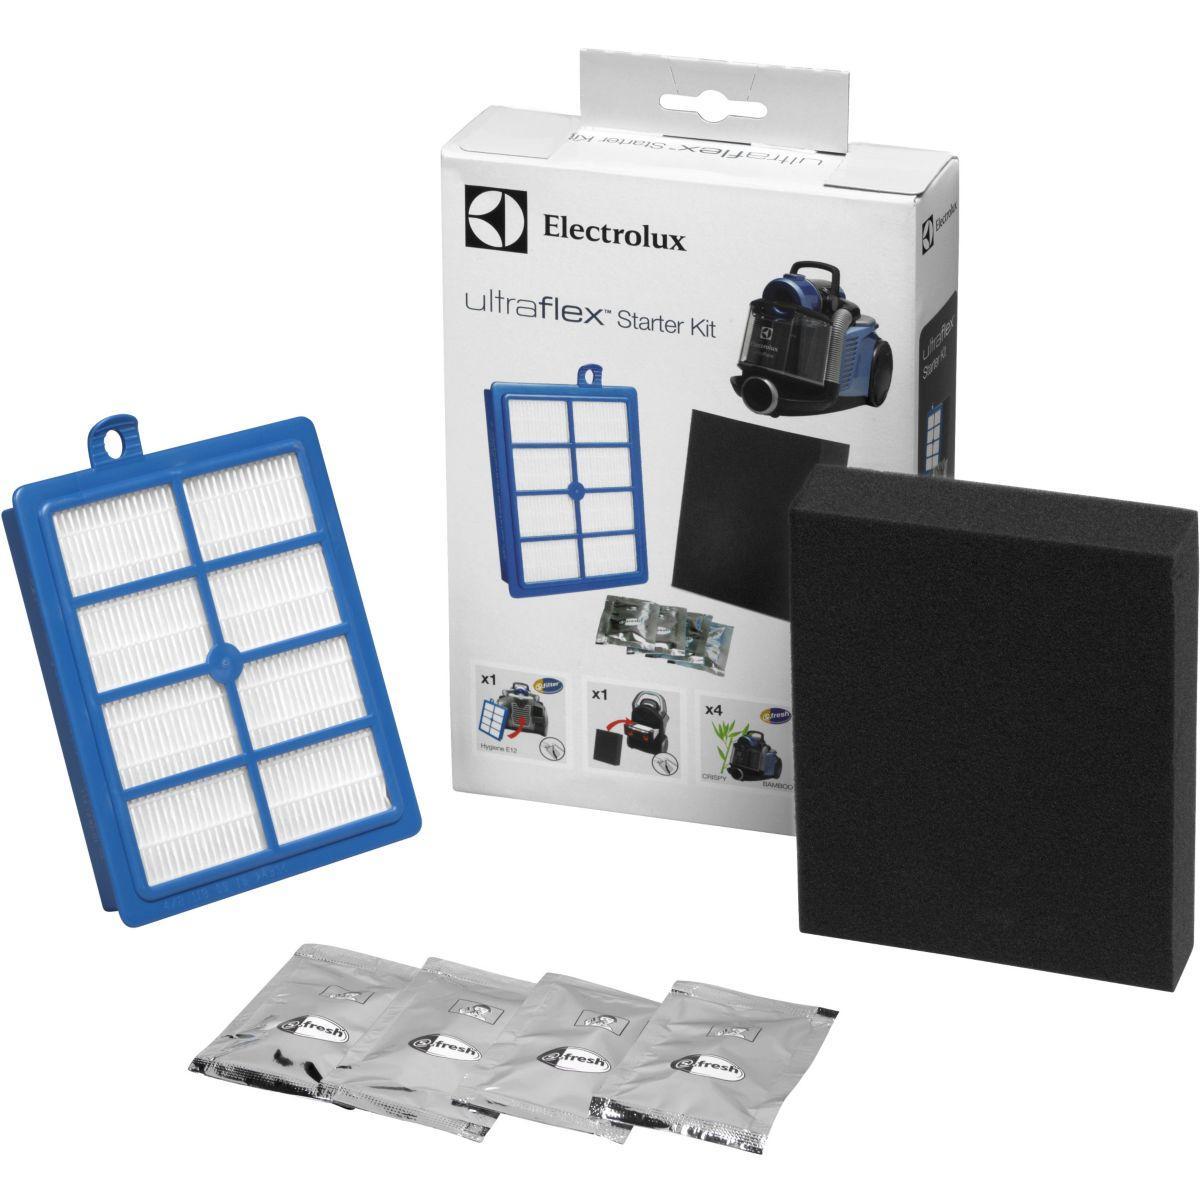 Filtre electrolux usk11 kit ultraflex - livraison offerte : code liv (photo)